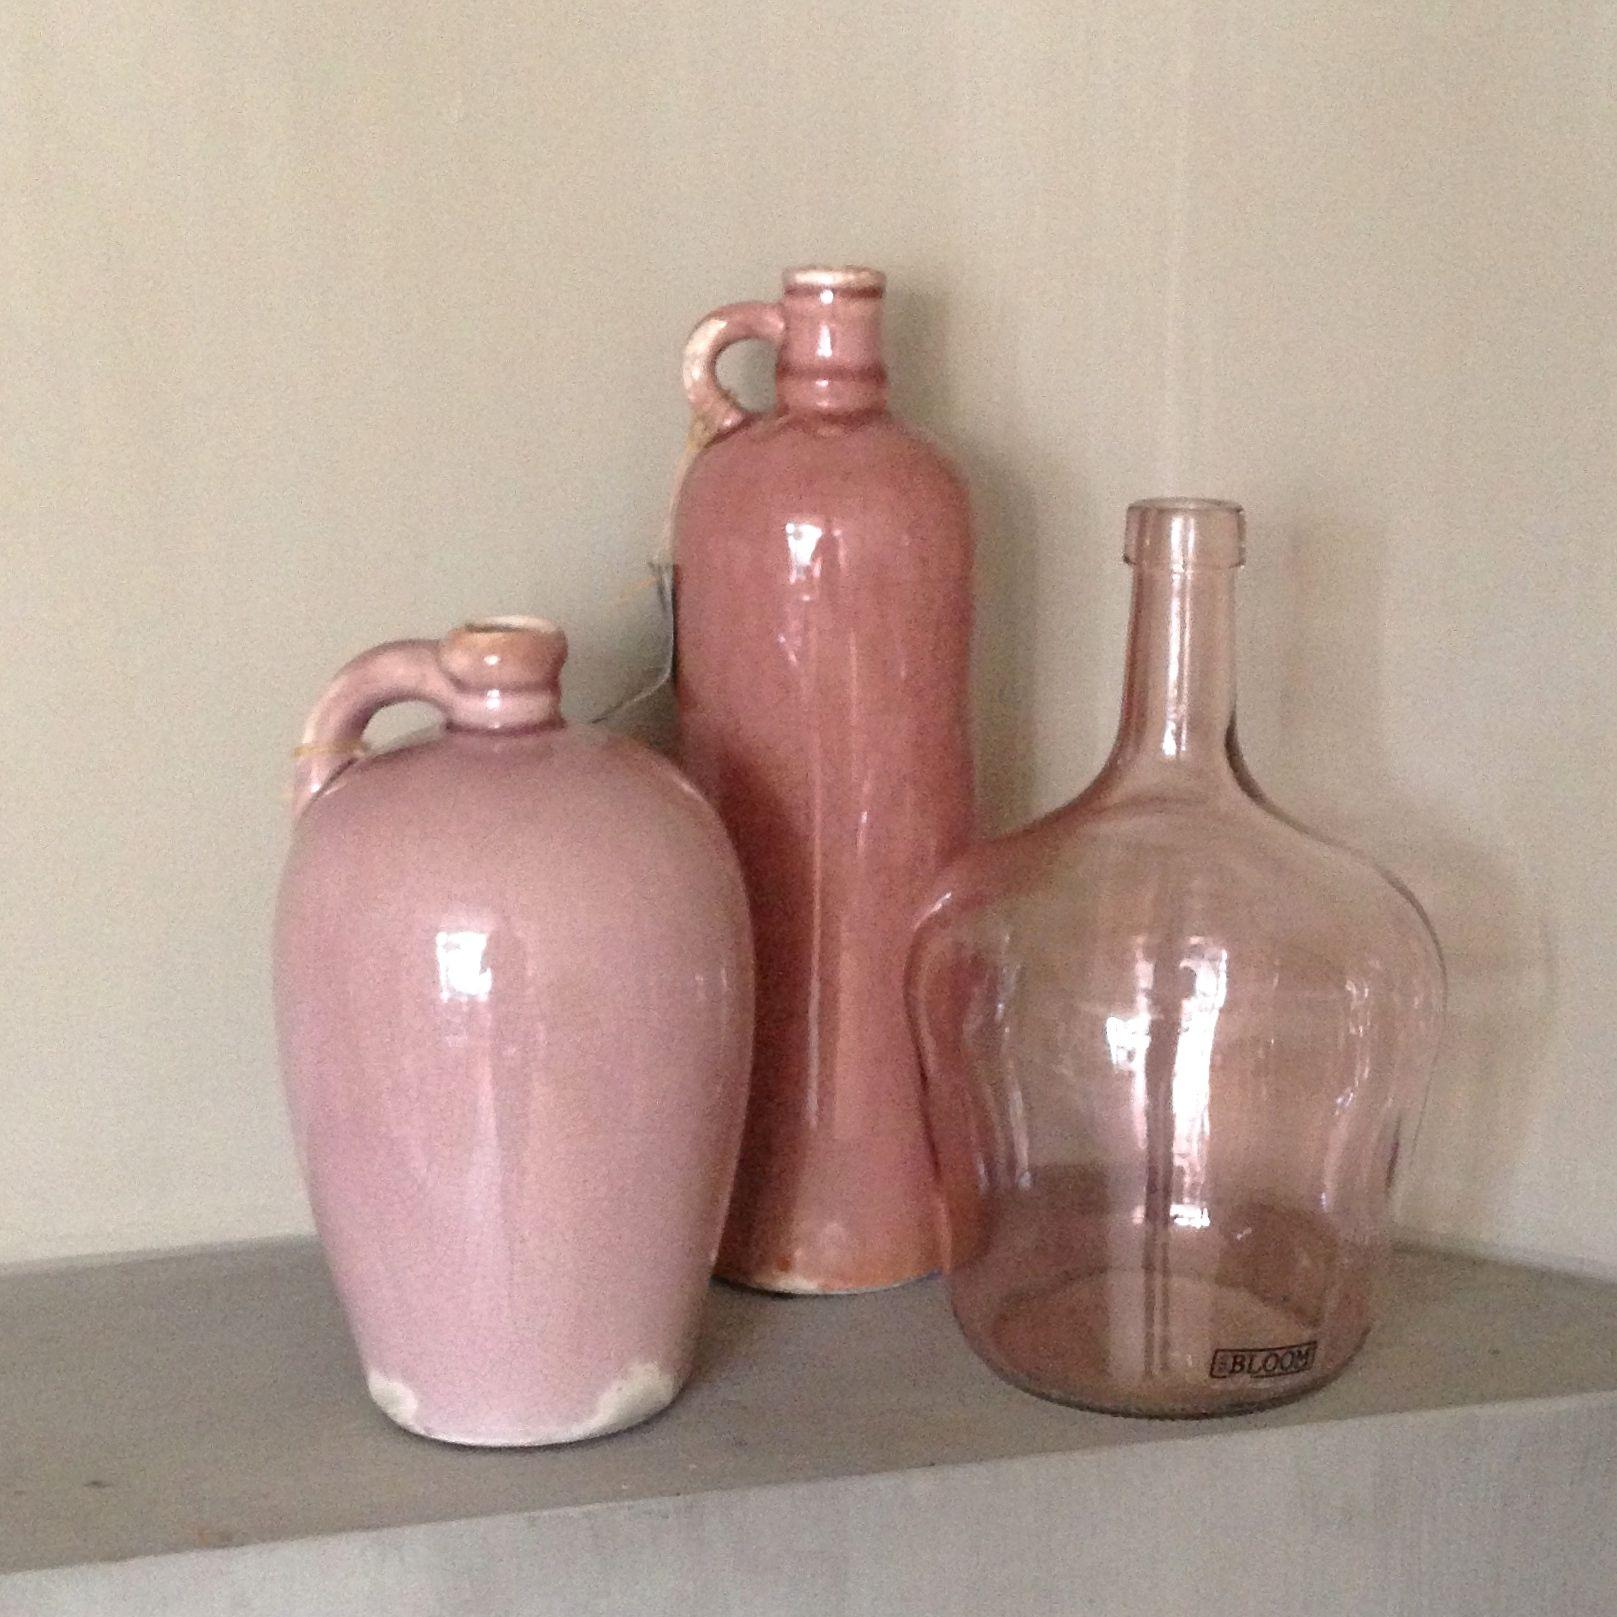 Accentkleur oud roze in vazen en flessen